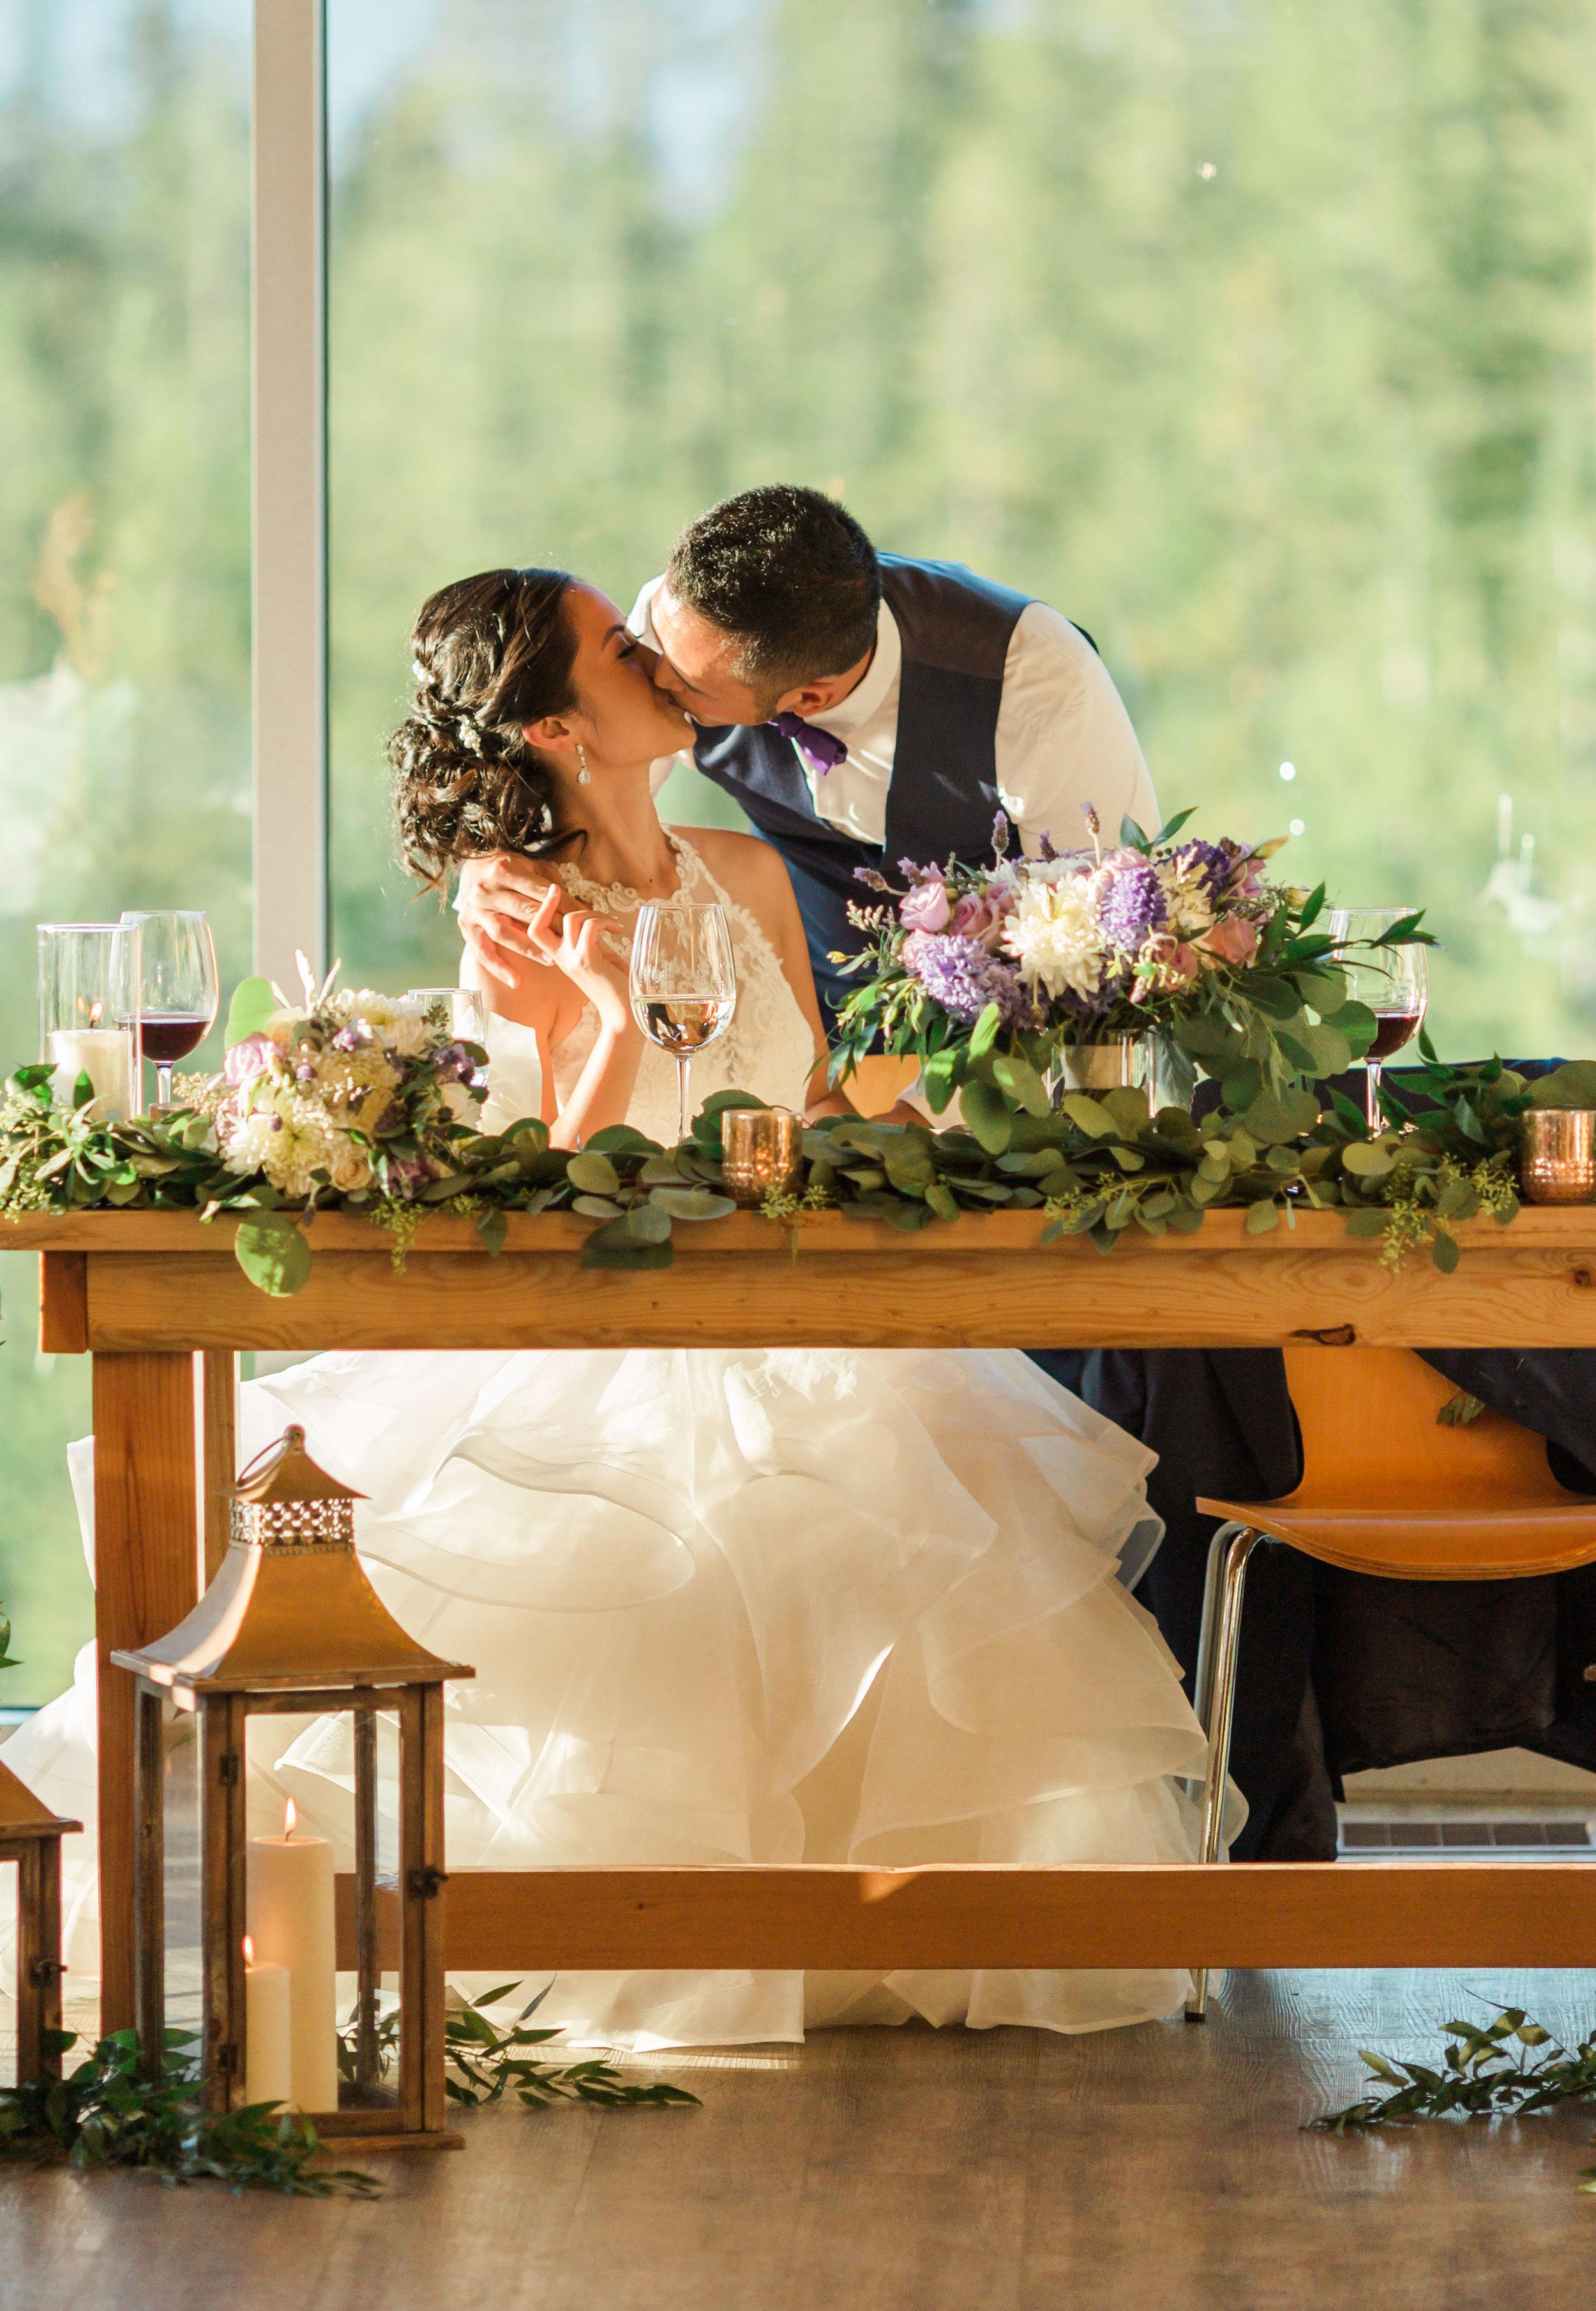 Squamish Wedding Photographer - Sea to Sky Gondola Wedding Photos -  Vancouver Wedding Photographer & Videographer - Sunshine Coast Wedding Photos - Sunshine Coast Wedding Photographer - Jennifer Picard Photography - IMG_4840.jpg